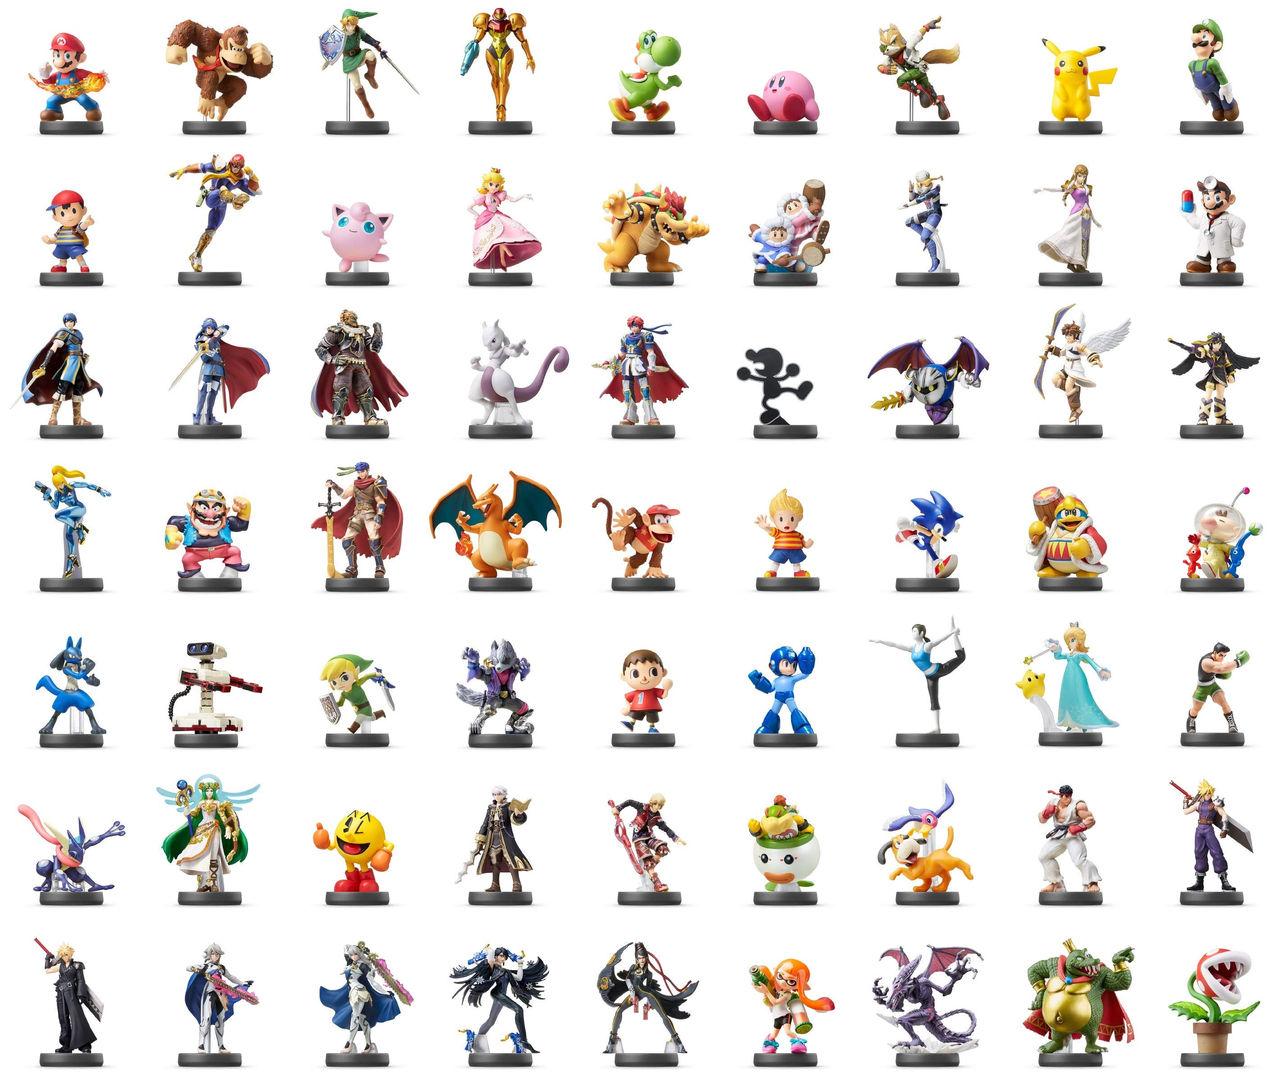 Amiibo-paket med 63 Smash Bros-figurer släpps i Japan